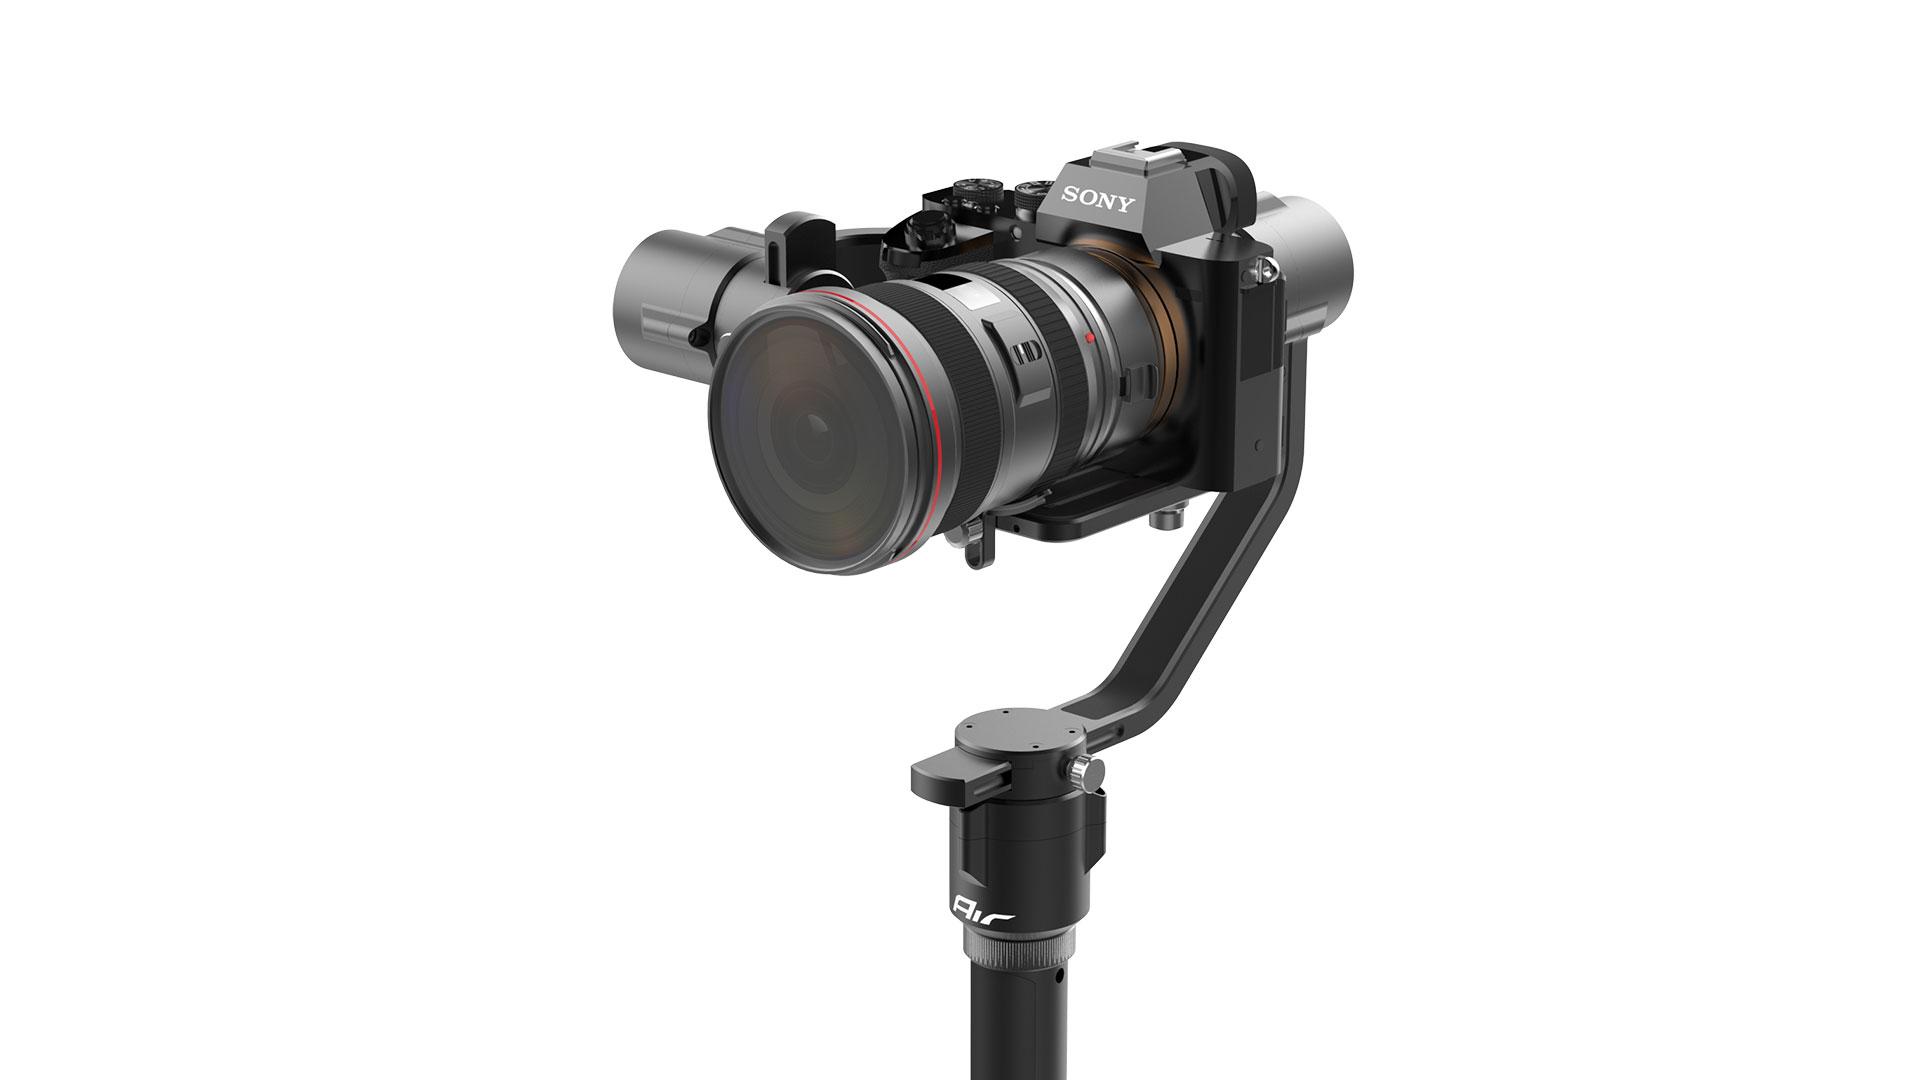 Gudsen MOZA Air: a $599 handheld gimbal for mirrorless and DSLR cameras